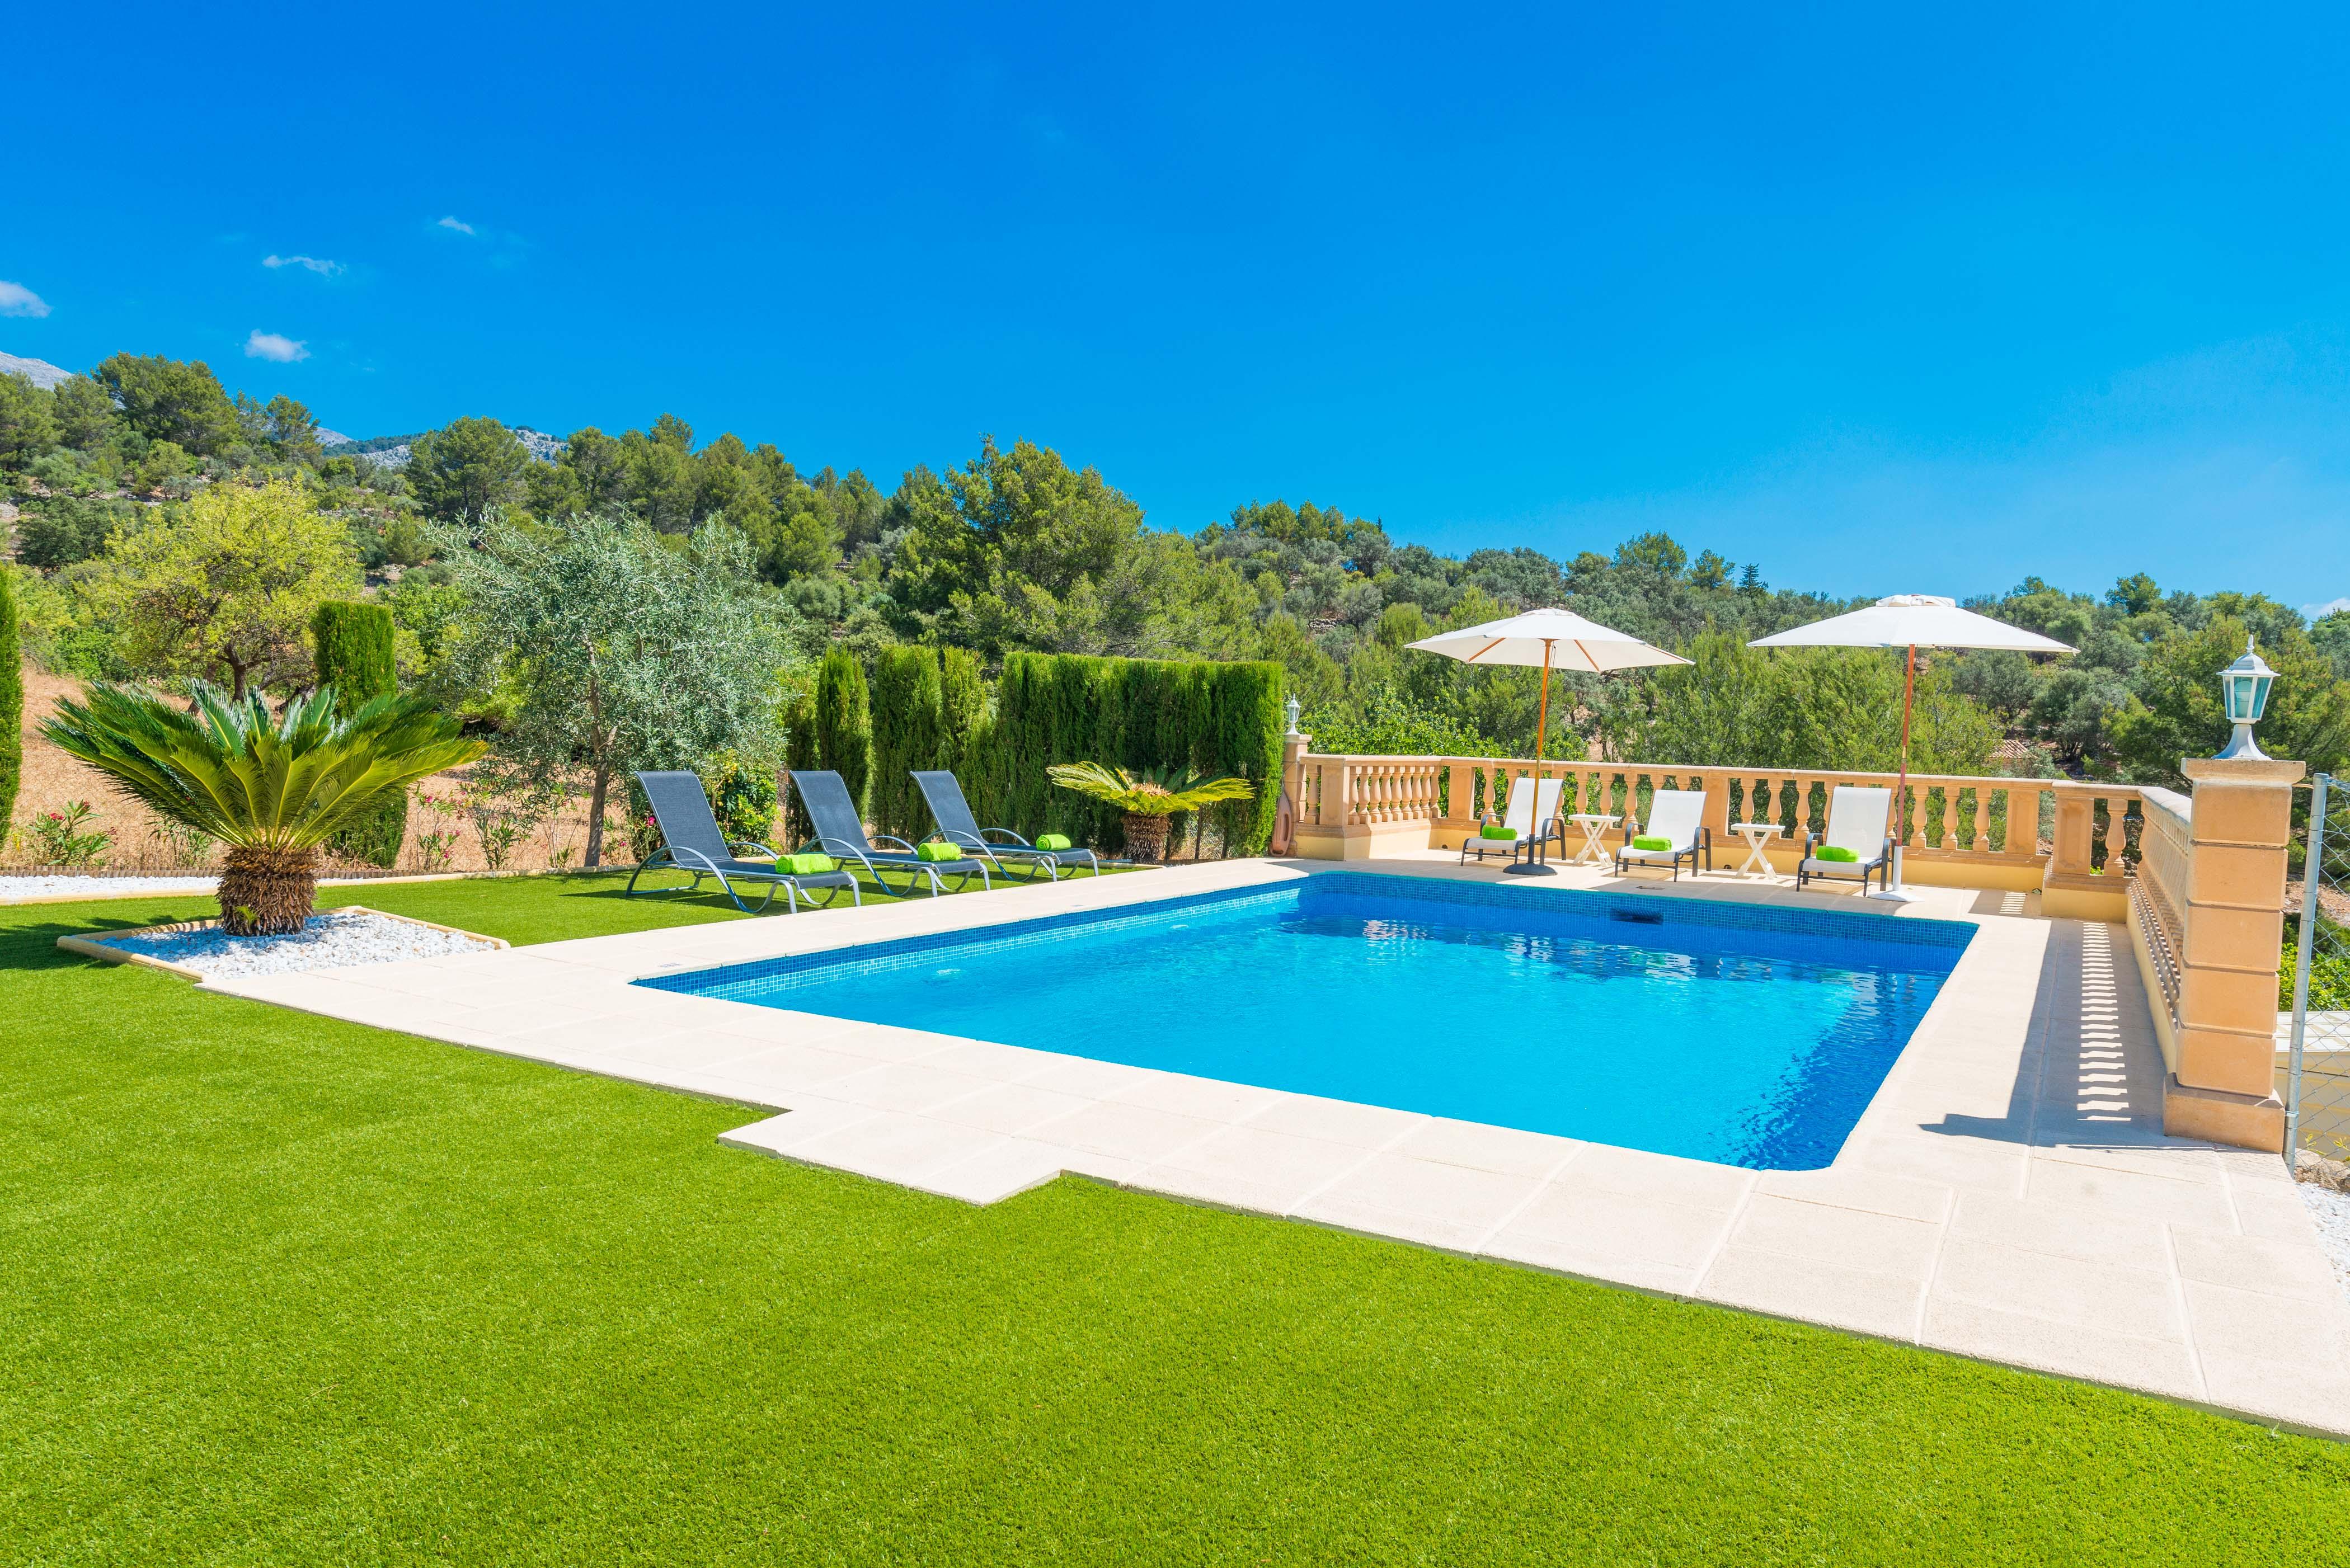 Ferienhaus SA TANCA (MANCORINA) (2037553), Mancor de la Vall, Mallorca, Balearische Inseln, Spanien, Bild 26